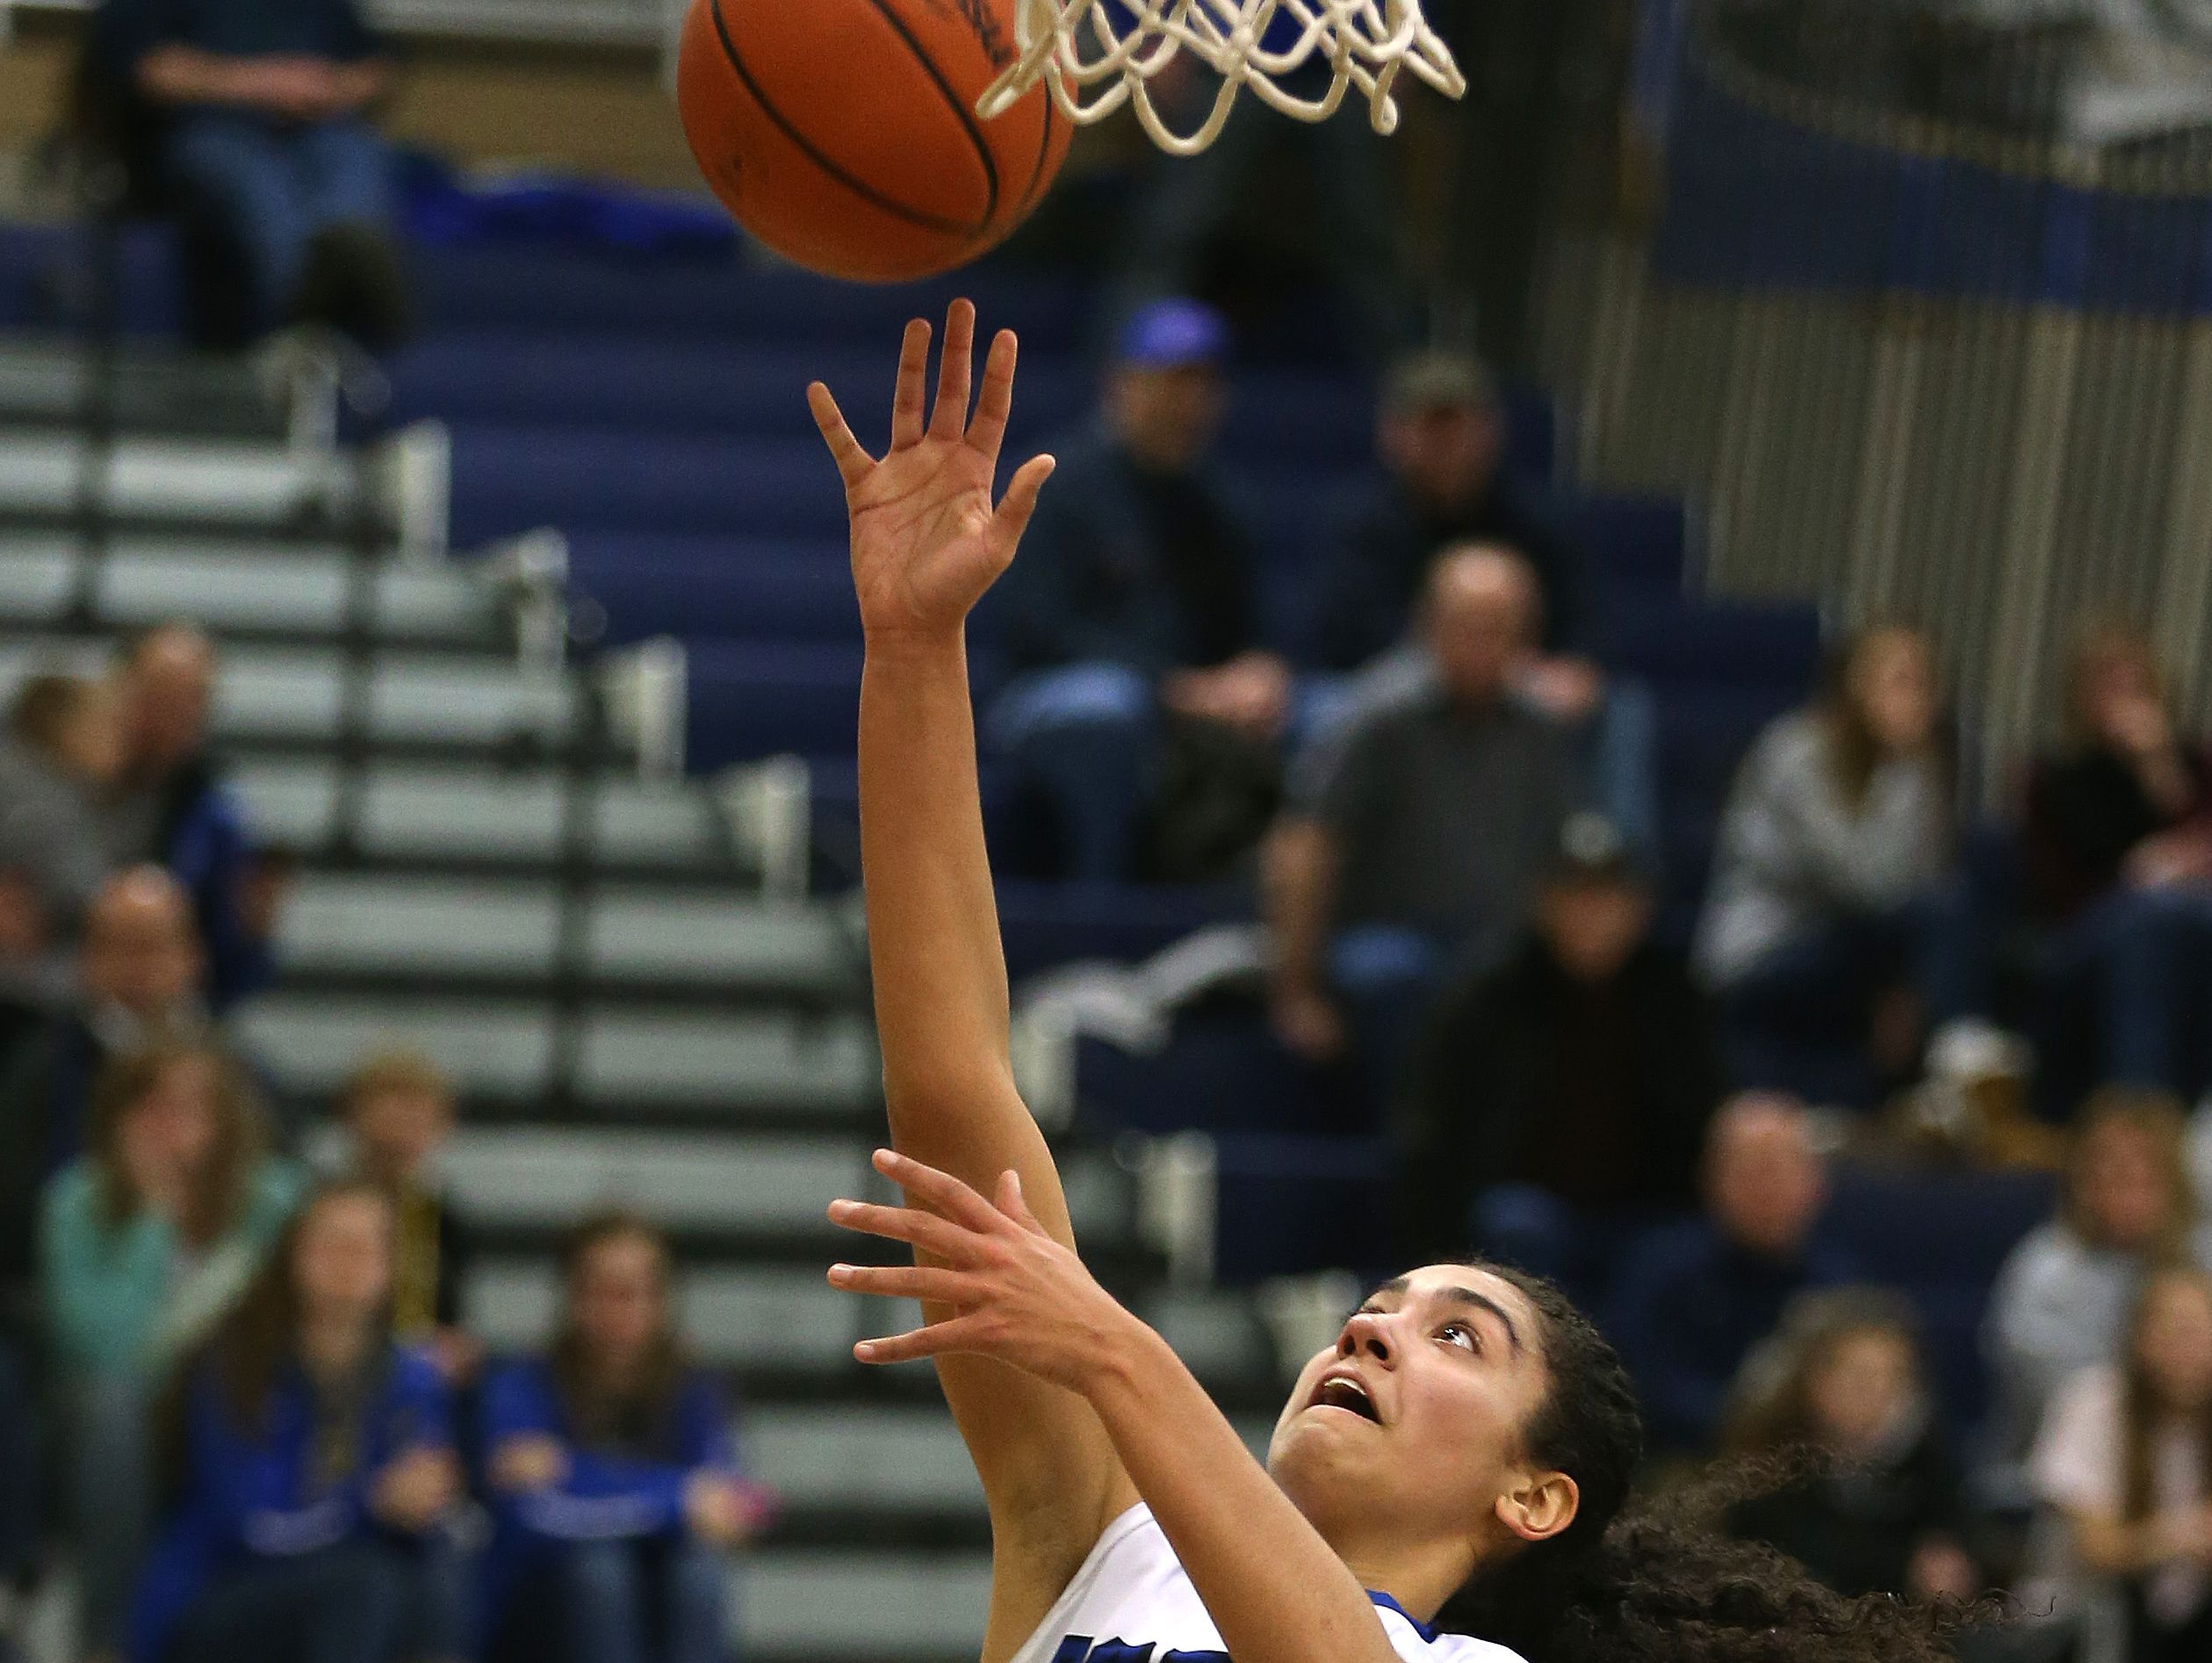 Batavia's Tiara Filbert drives to the basket .